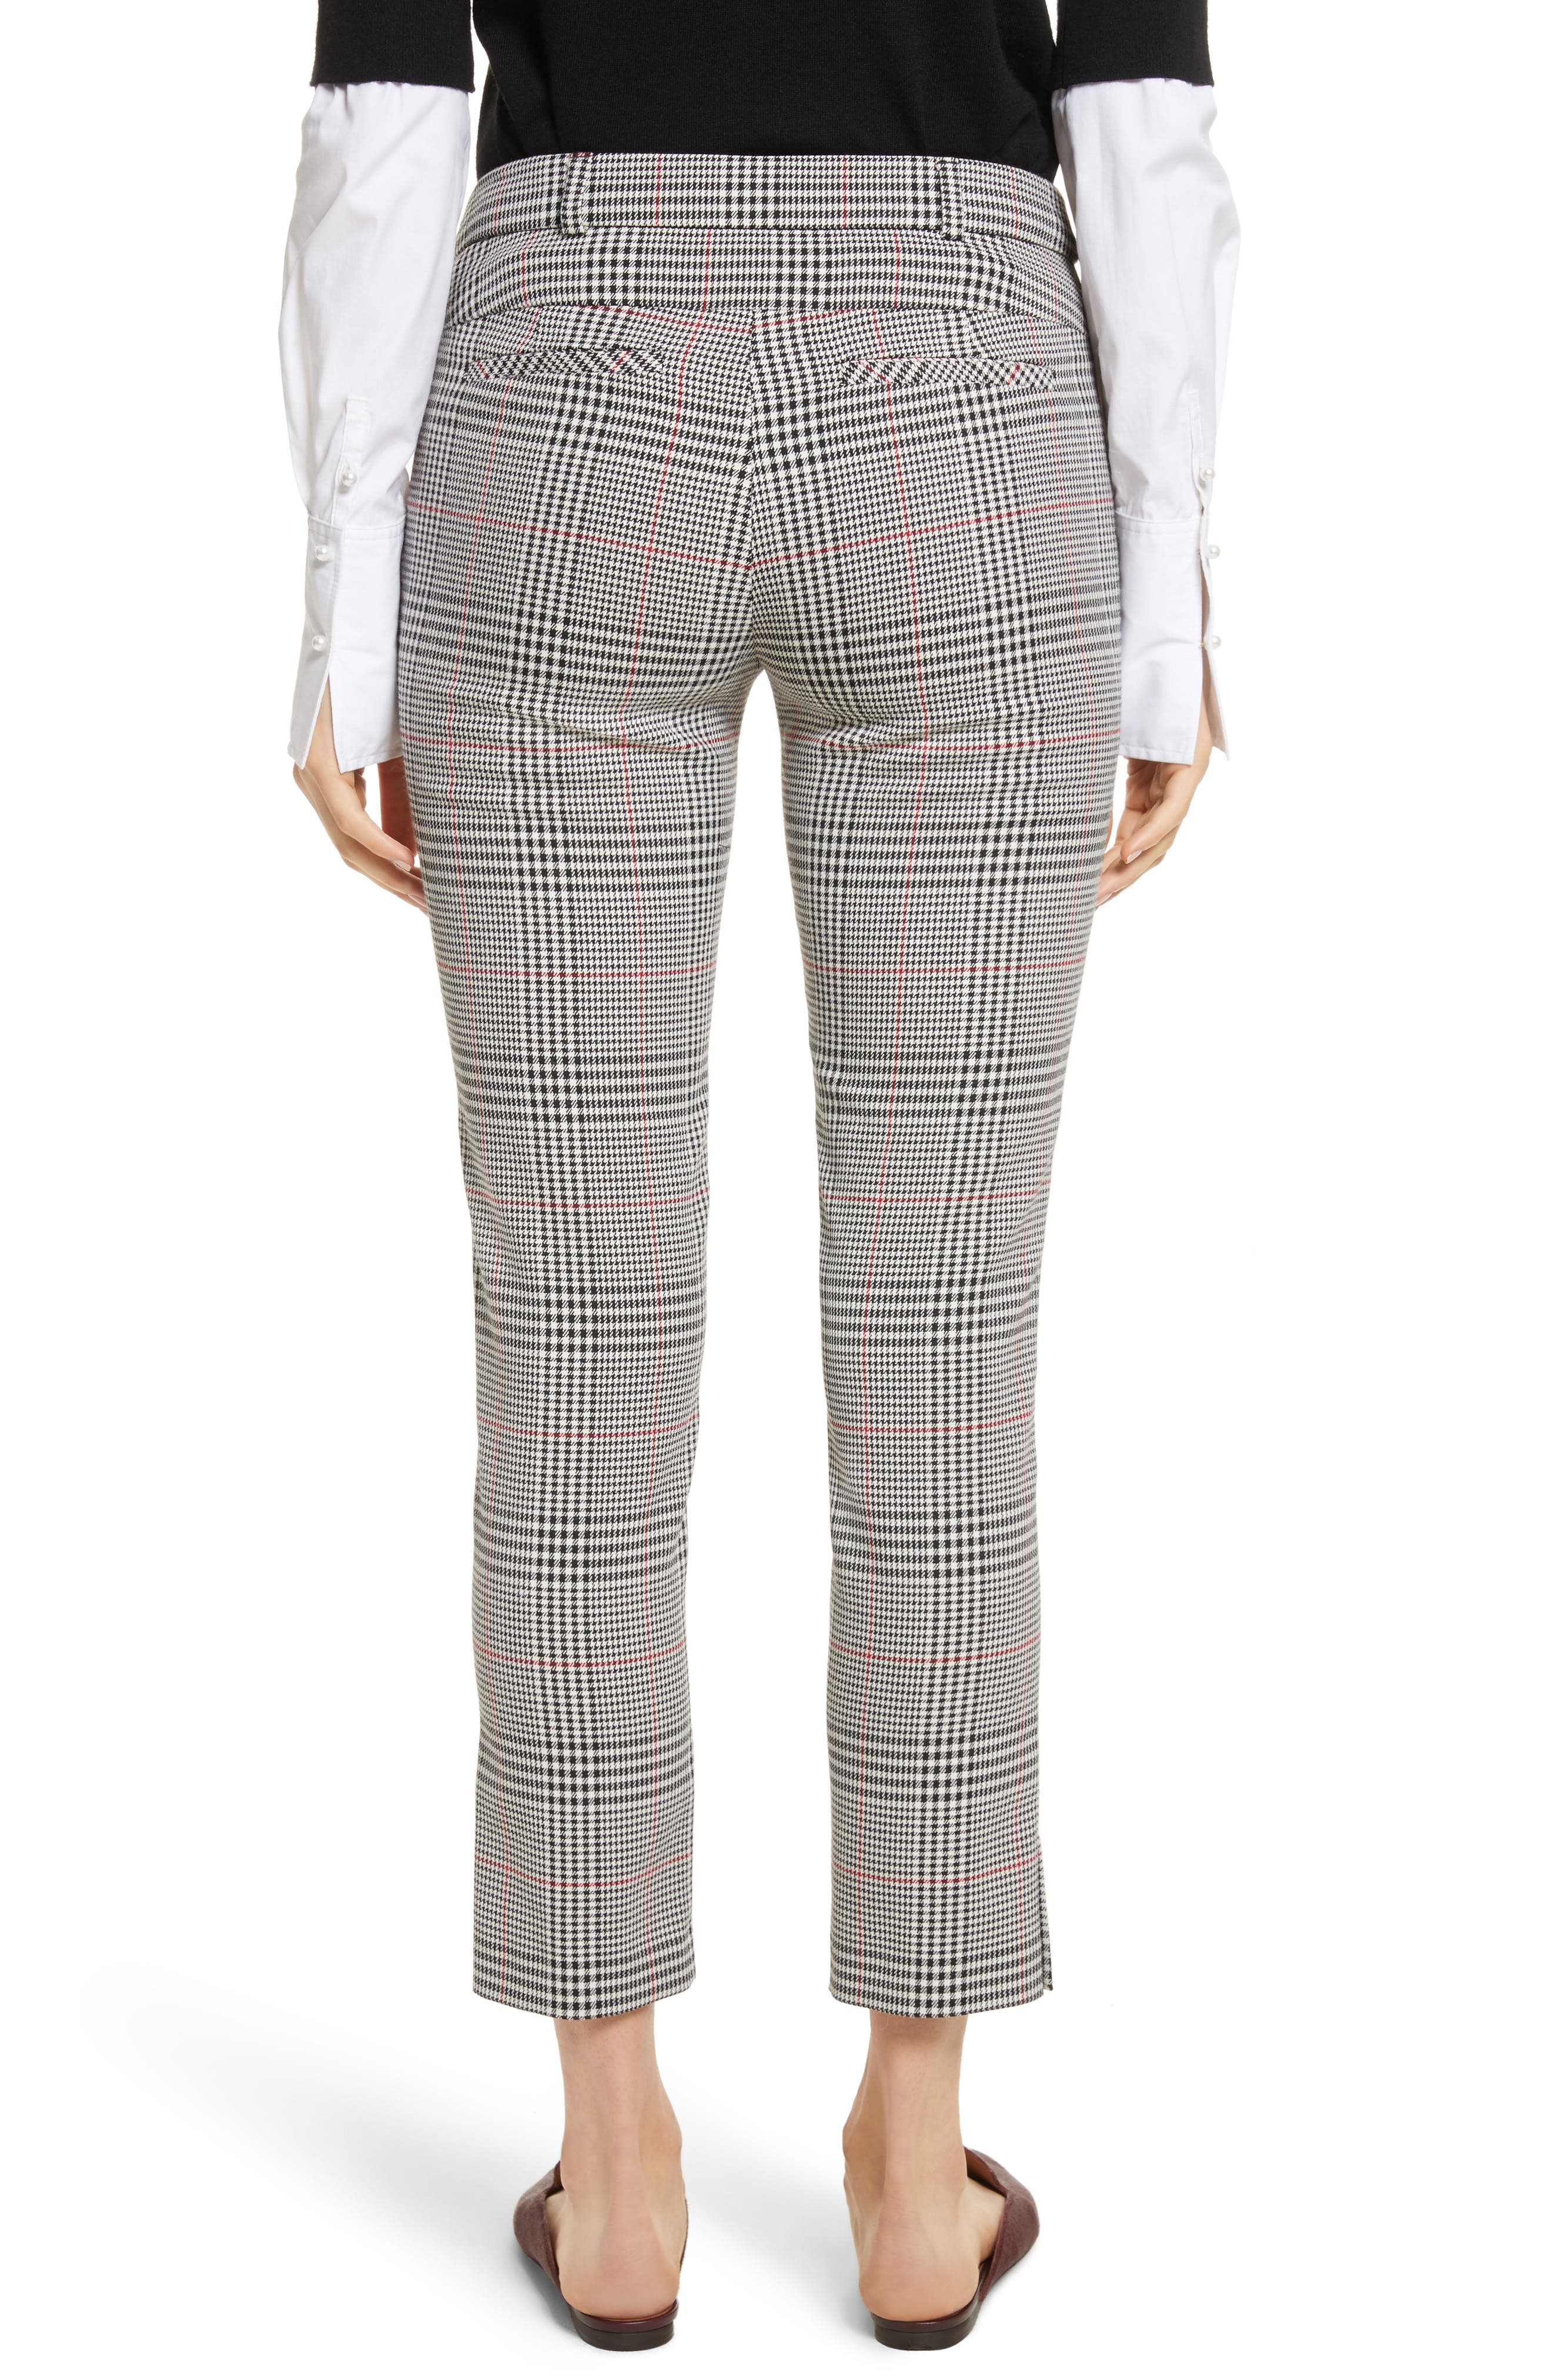 Farrow Pants,                             Alternate thumbnail 2, color,                             White/ Black/ Red